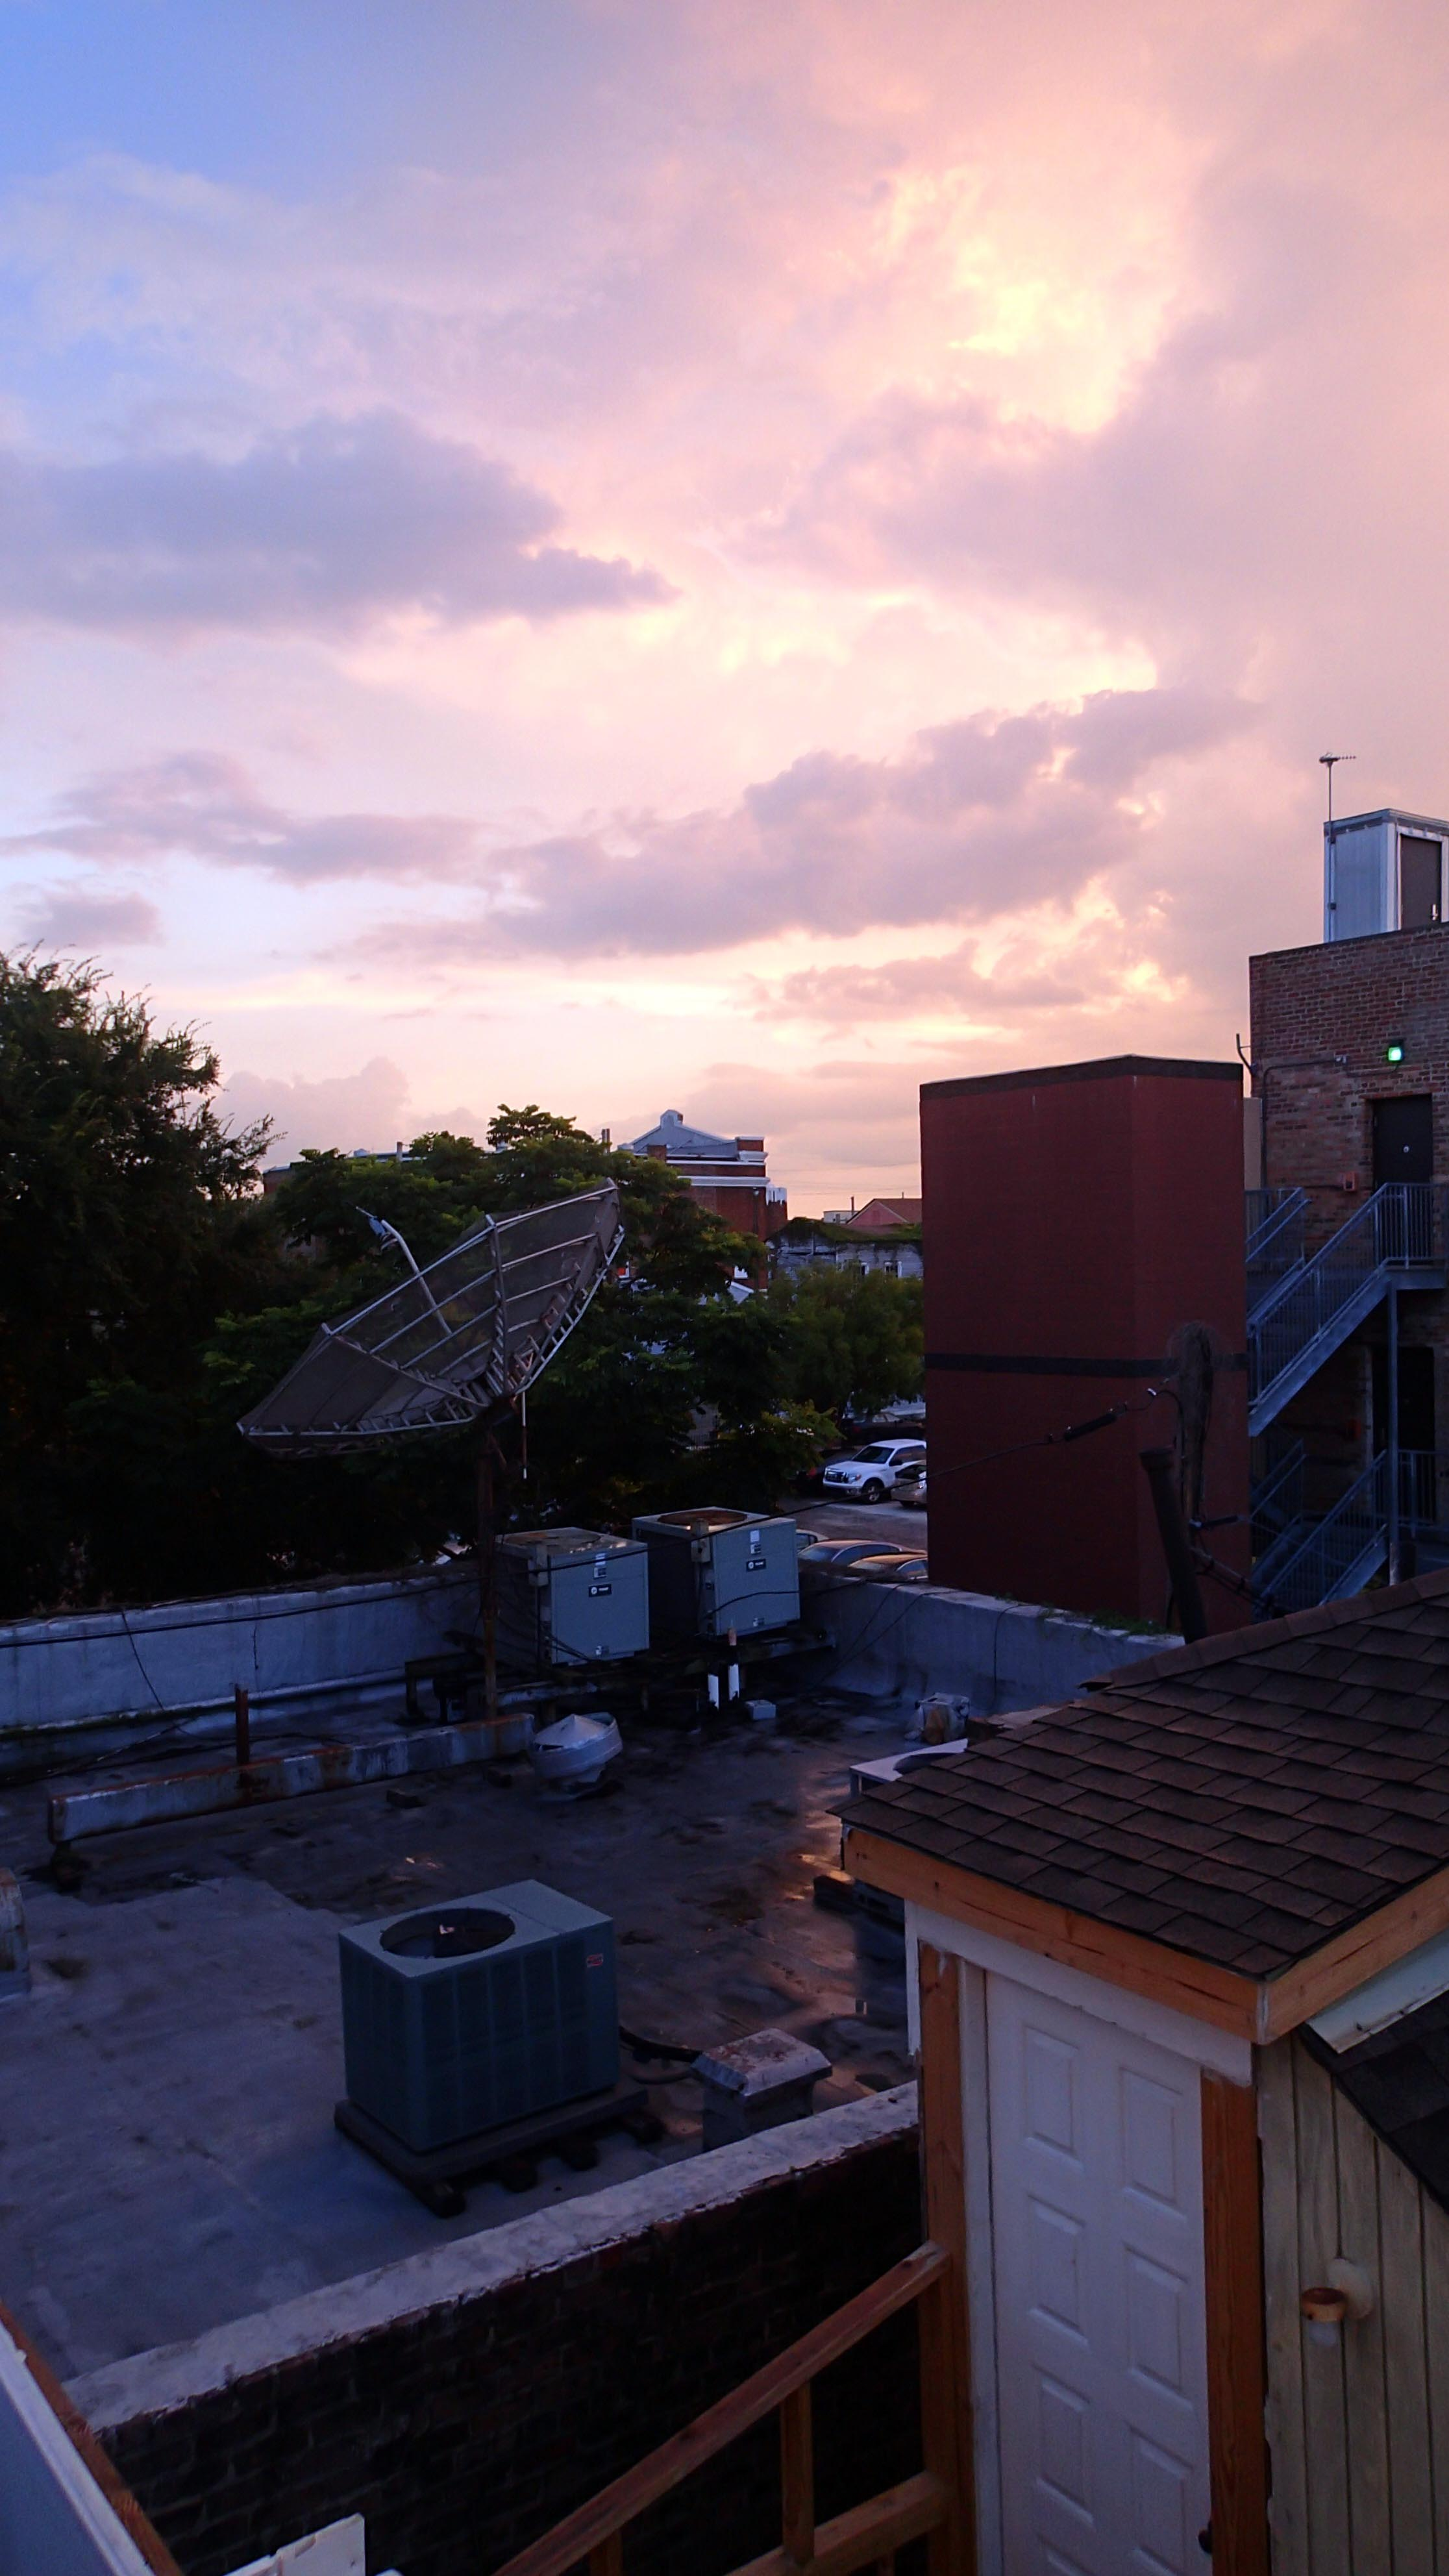 2014-8-8 sunset.jpg